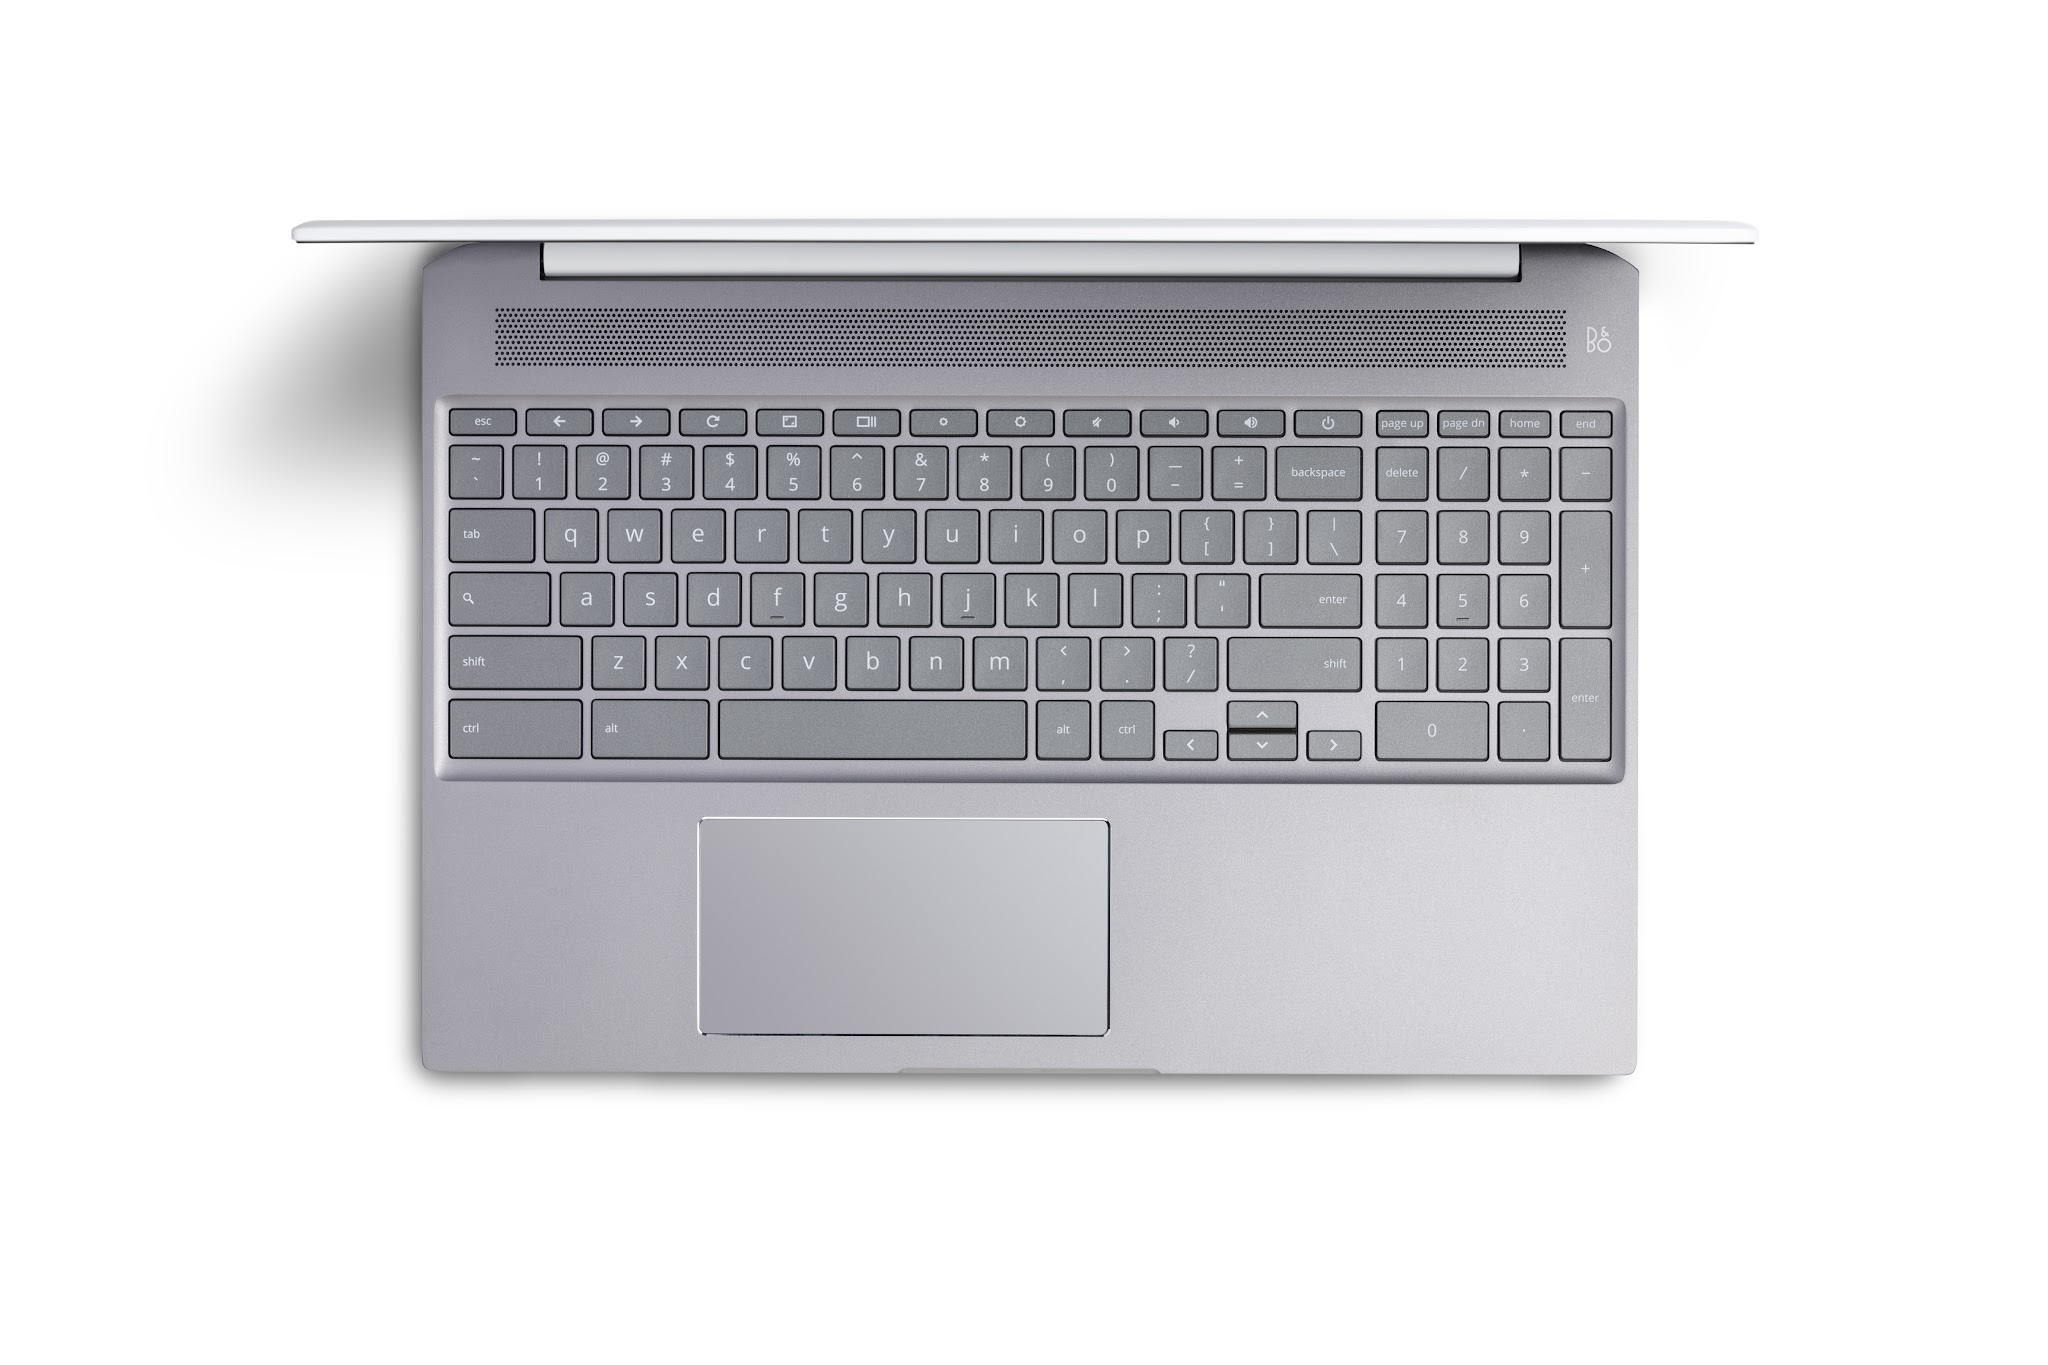 HP Chromebook 15 - photo 3